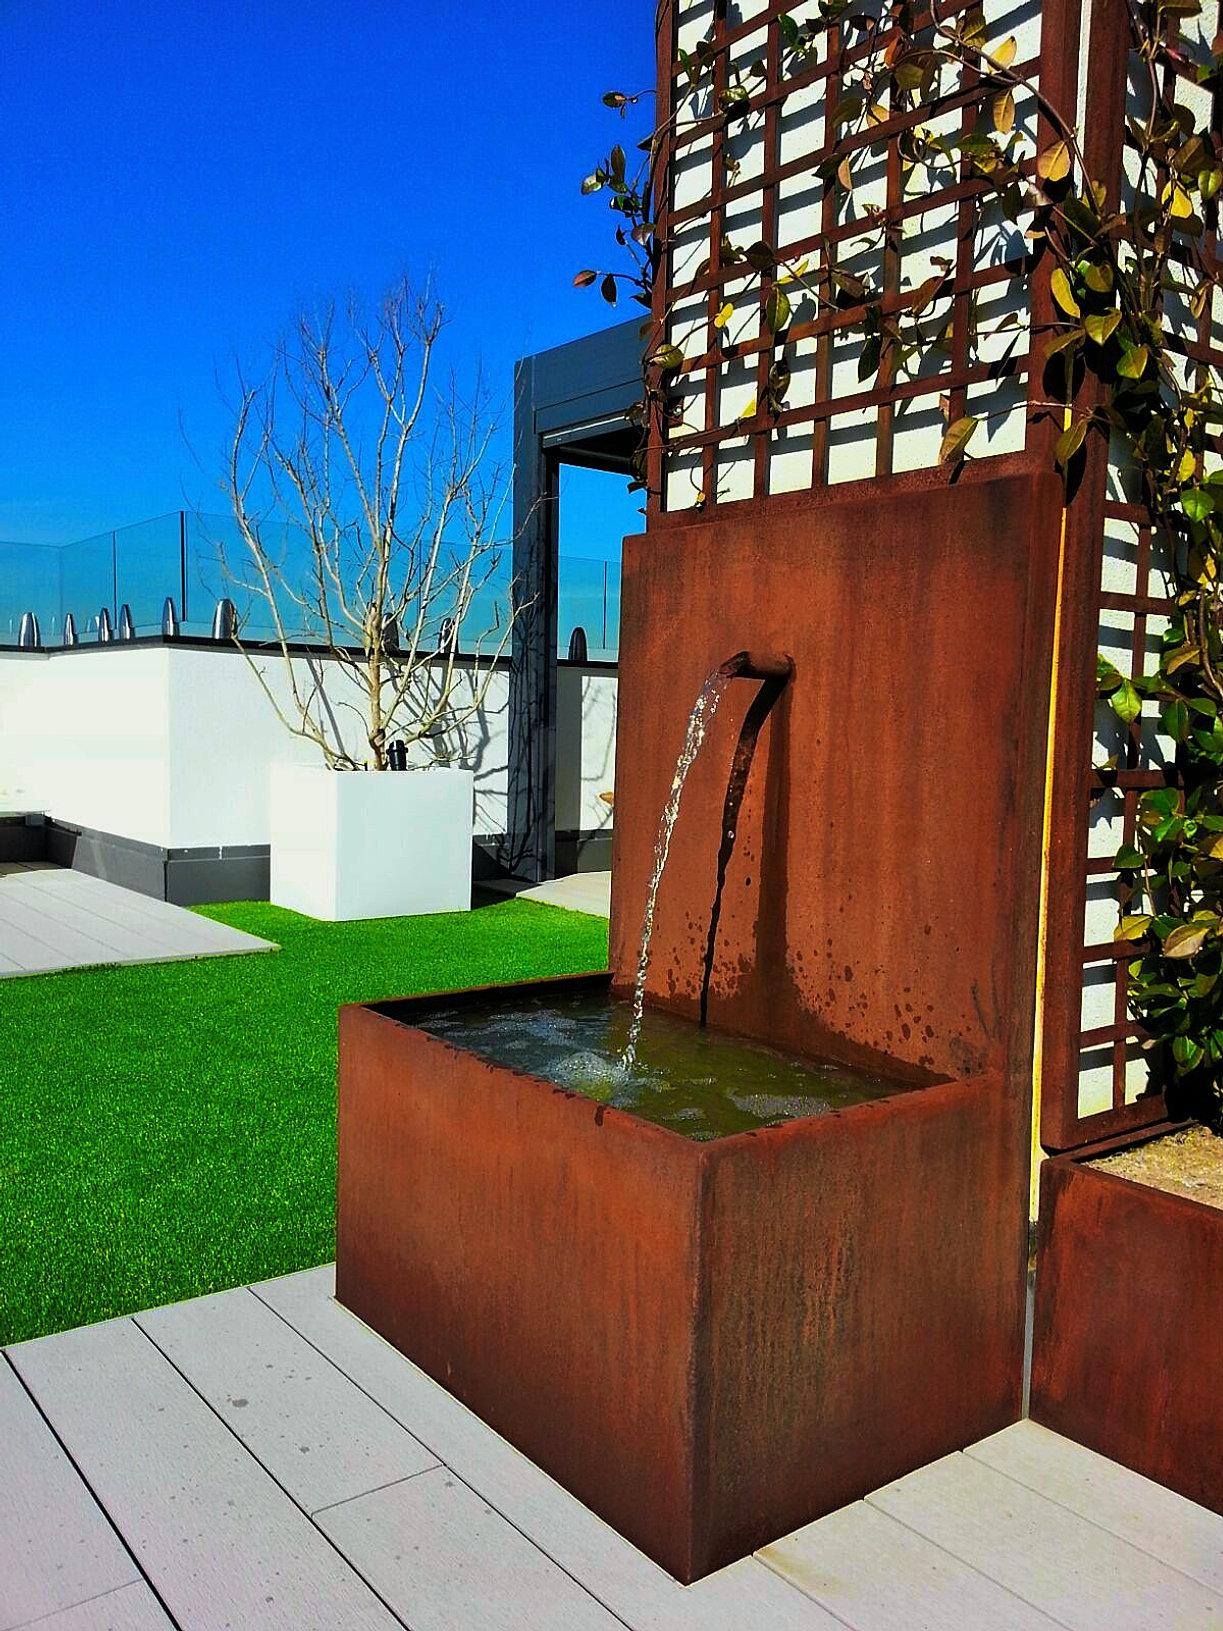 Fuentes de exterior para jardin latest affordable fuentes - Fuentes de exterior ...